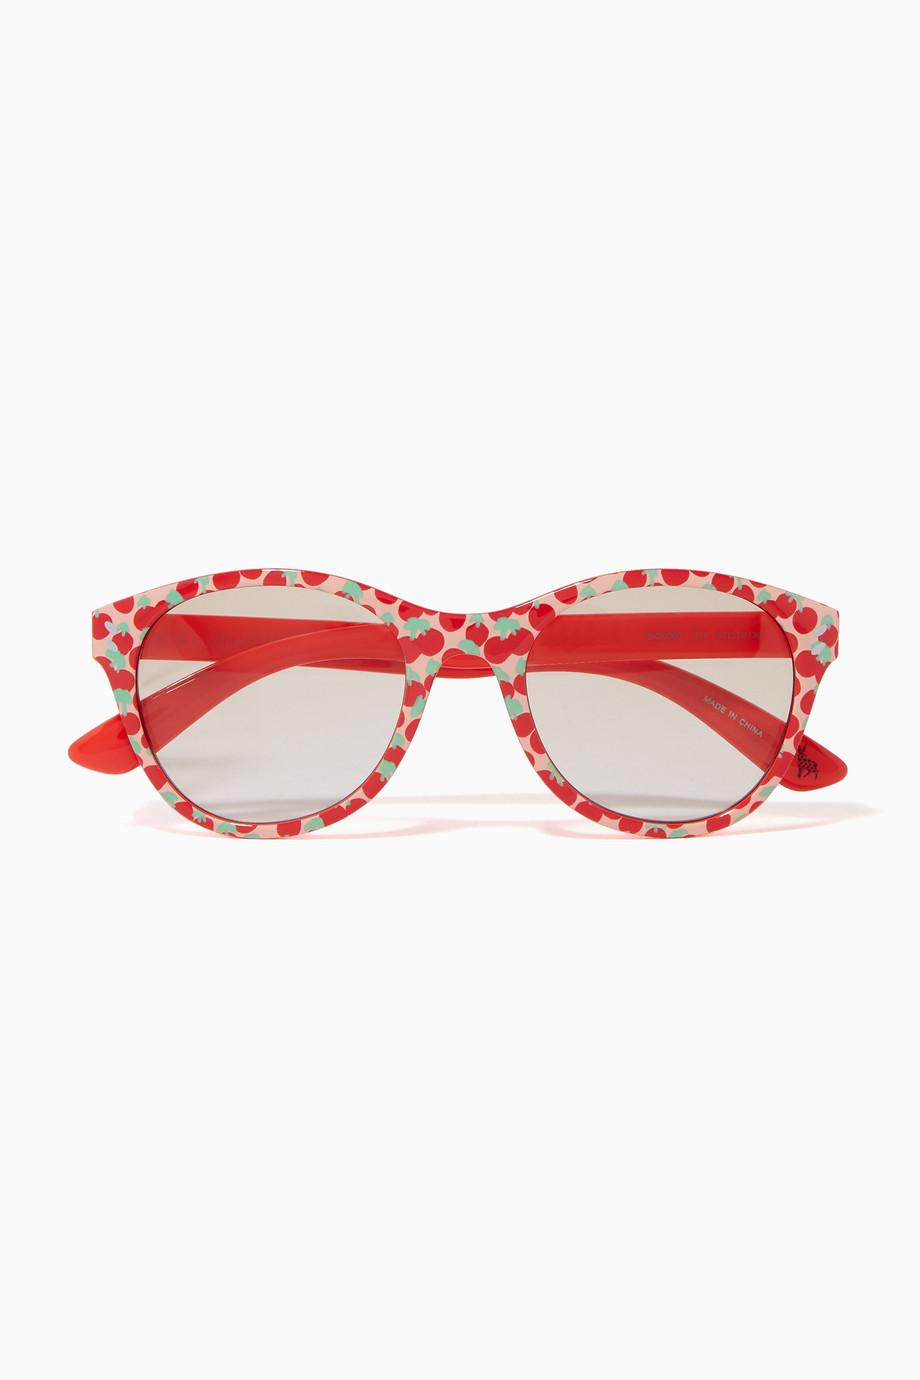 2e72f142217 Shop Stella McCartney Red Red Cherry Sunglasses for Kids